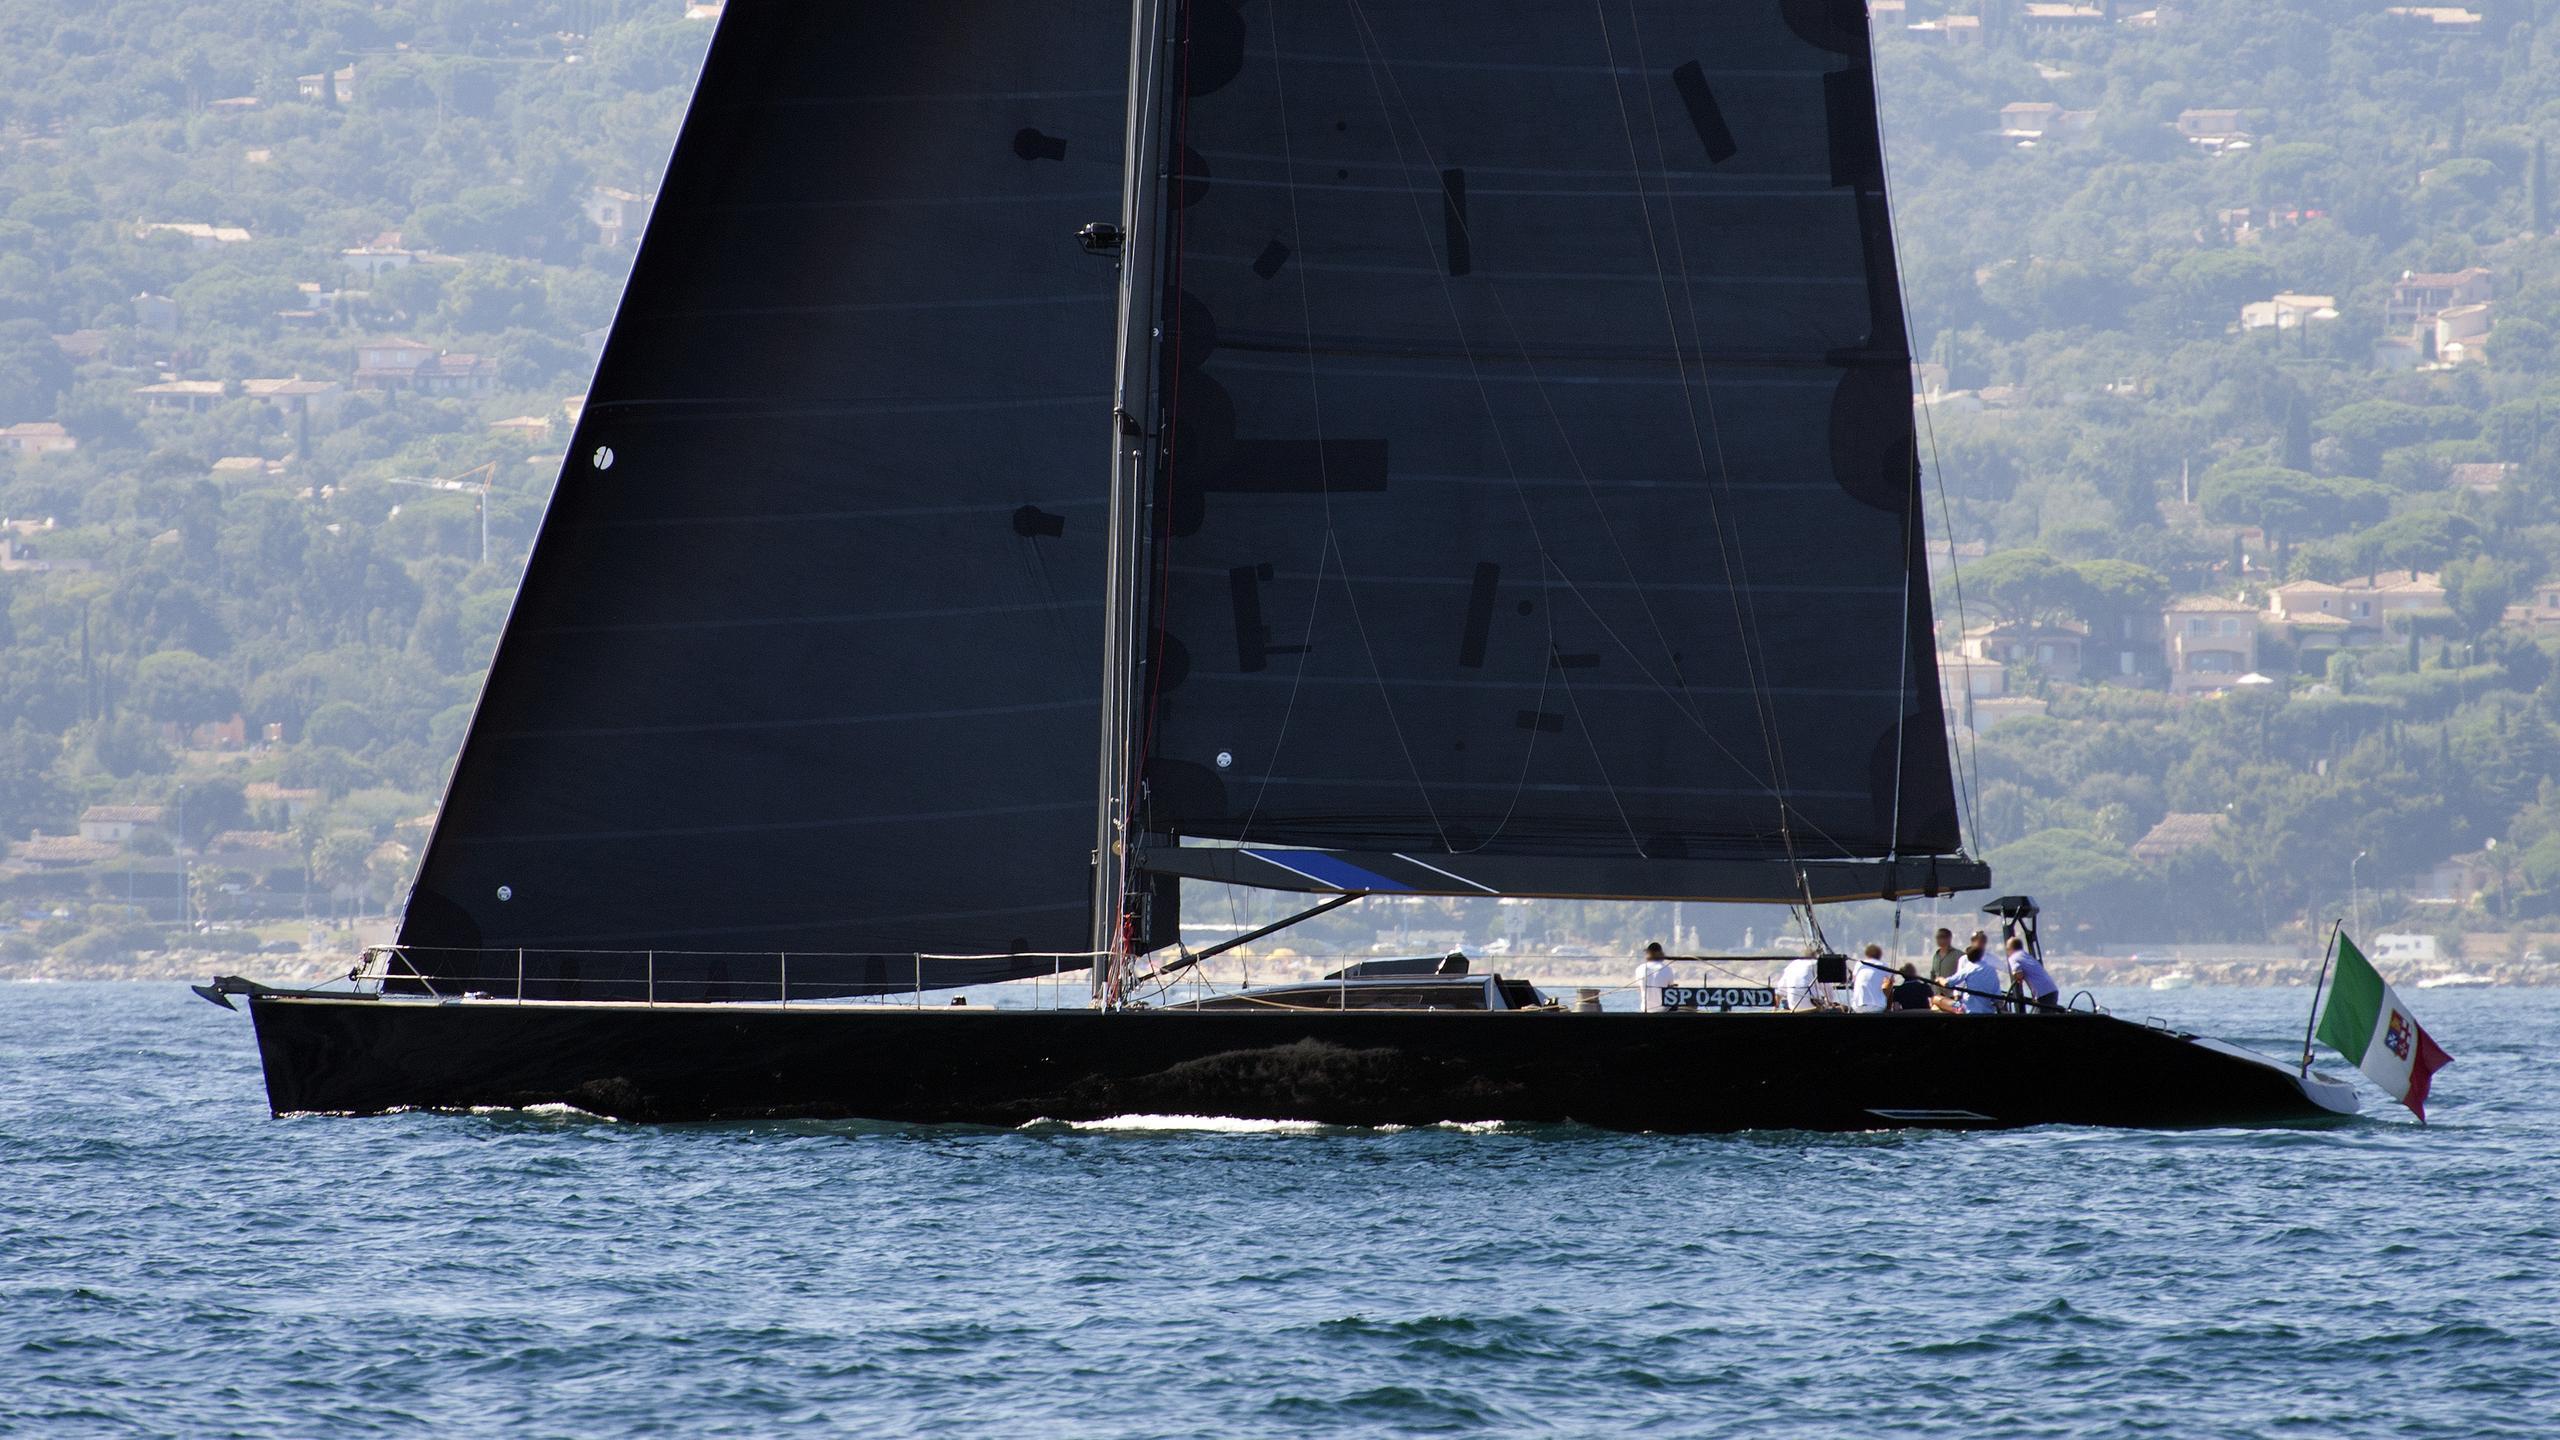 stealth-sailing-yacht-green-marine-28m-1996-running